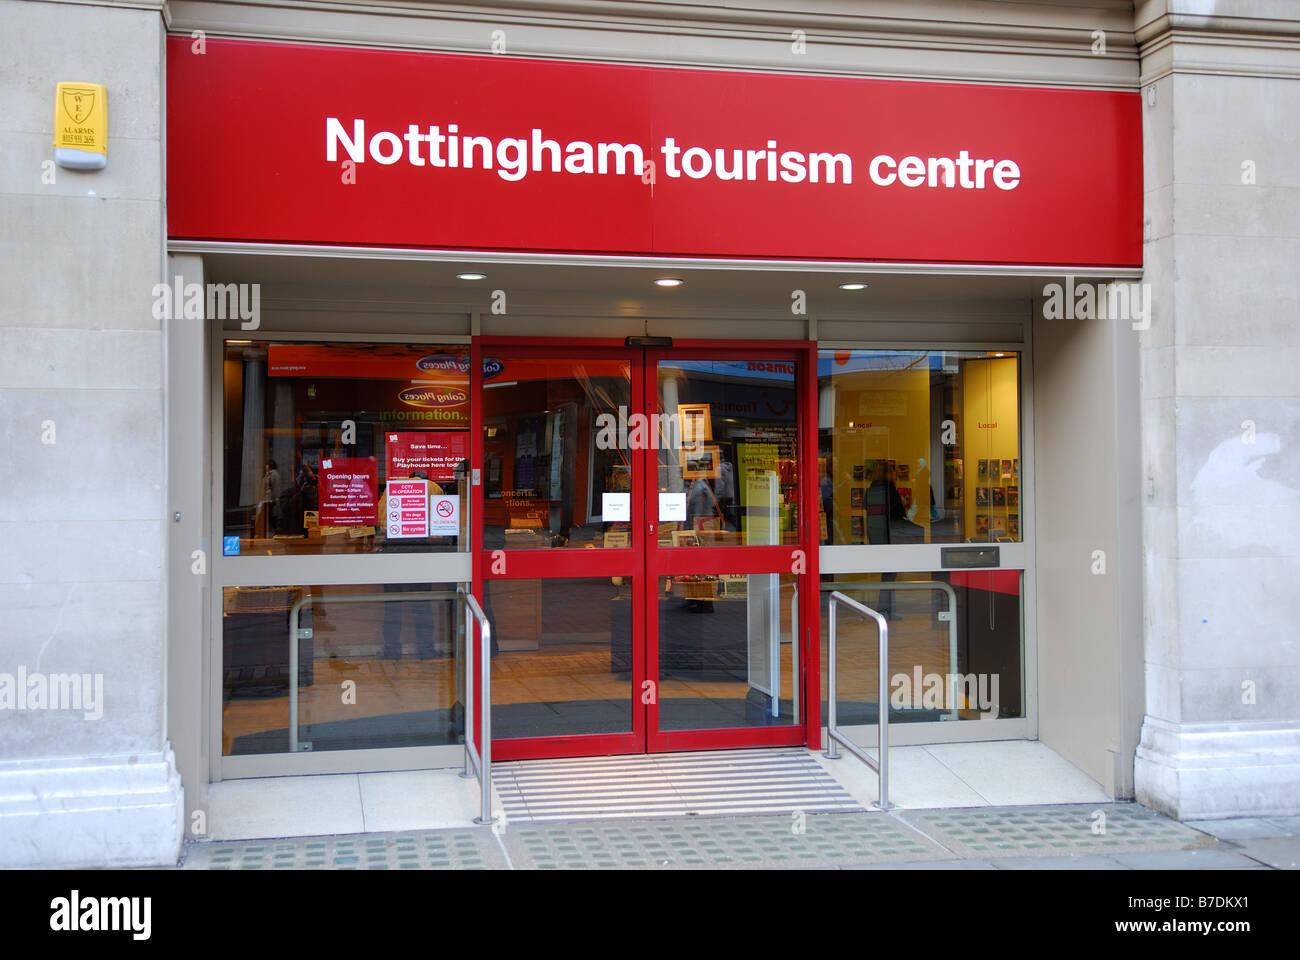 Nottingham Tourist Centre. - Stock Image